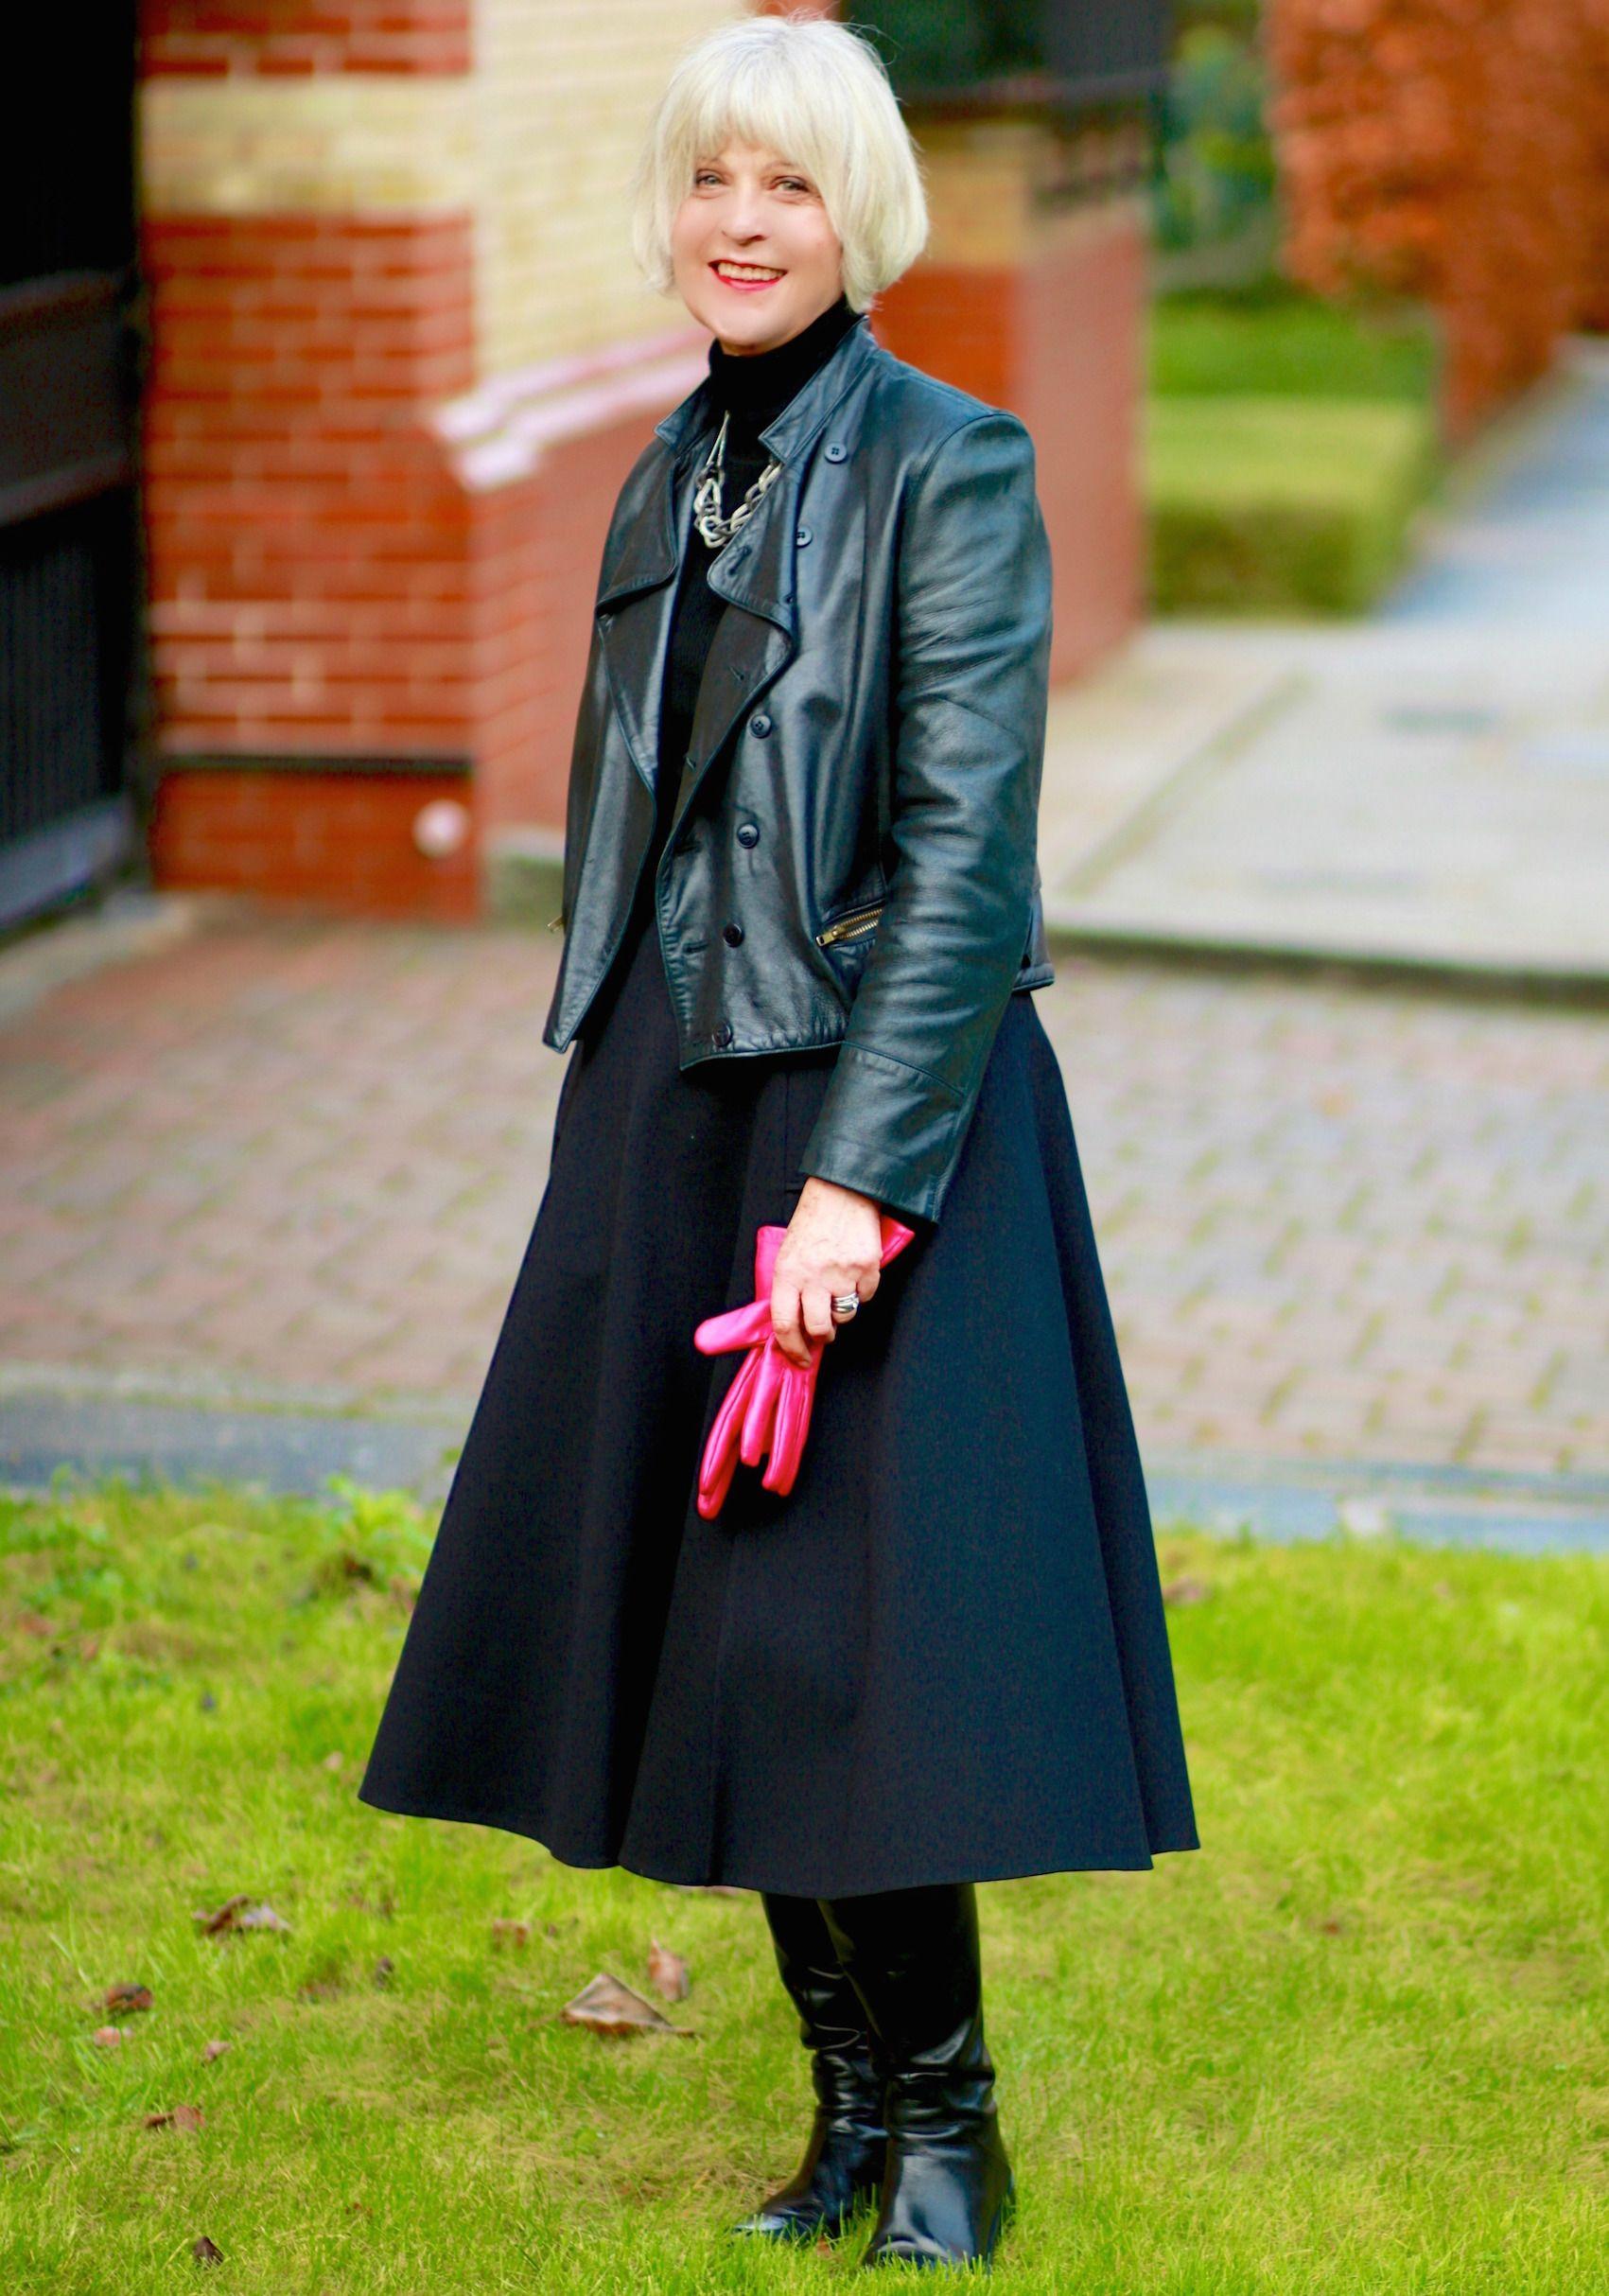 Pin by Belen Pierson on Stitch Fix Style Fashion